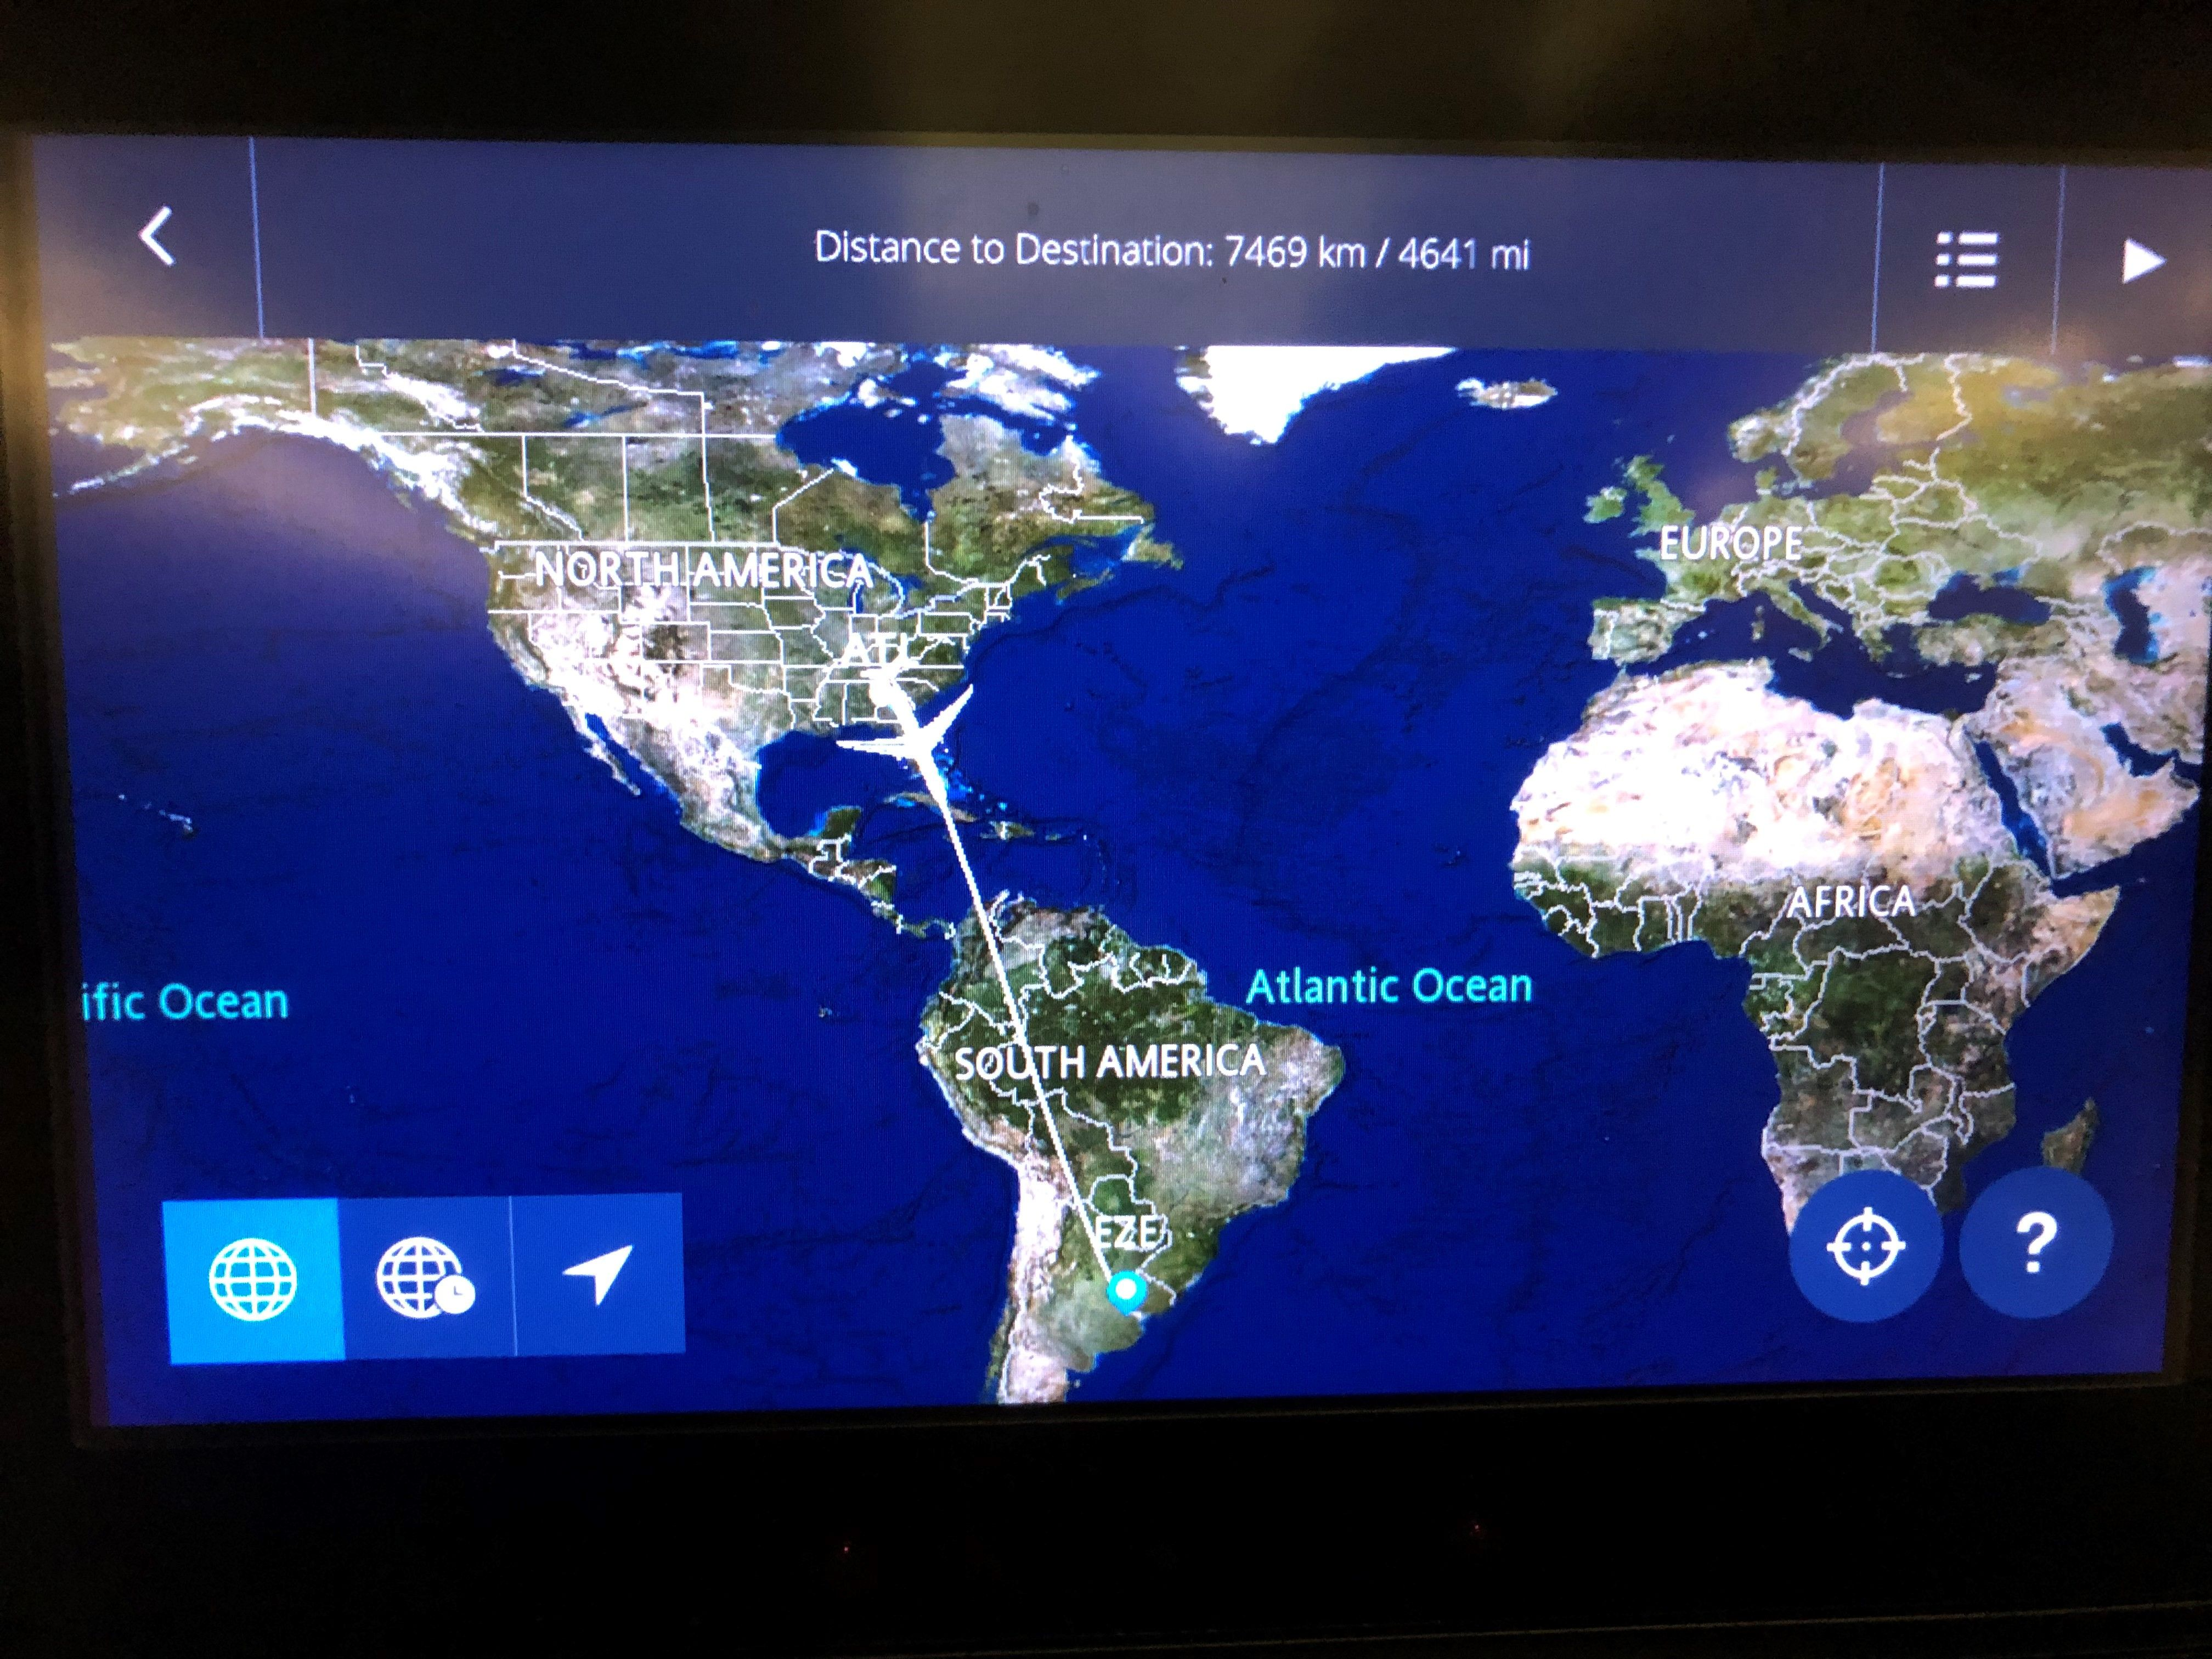 Destination Ahead